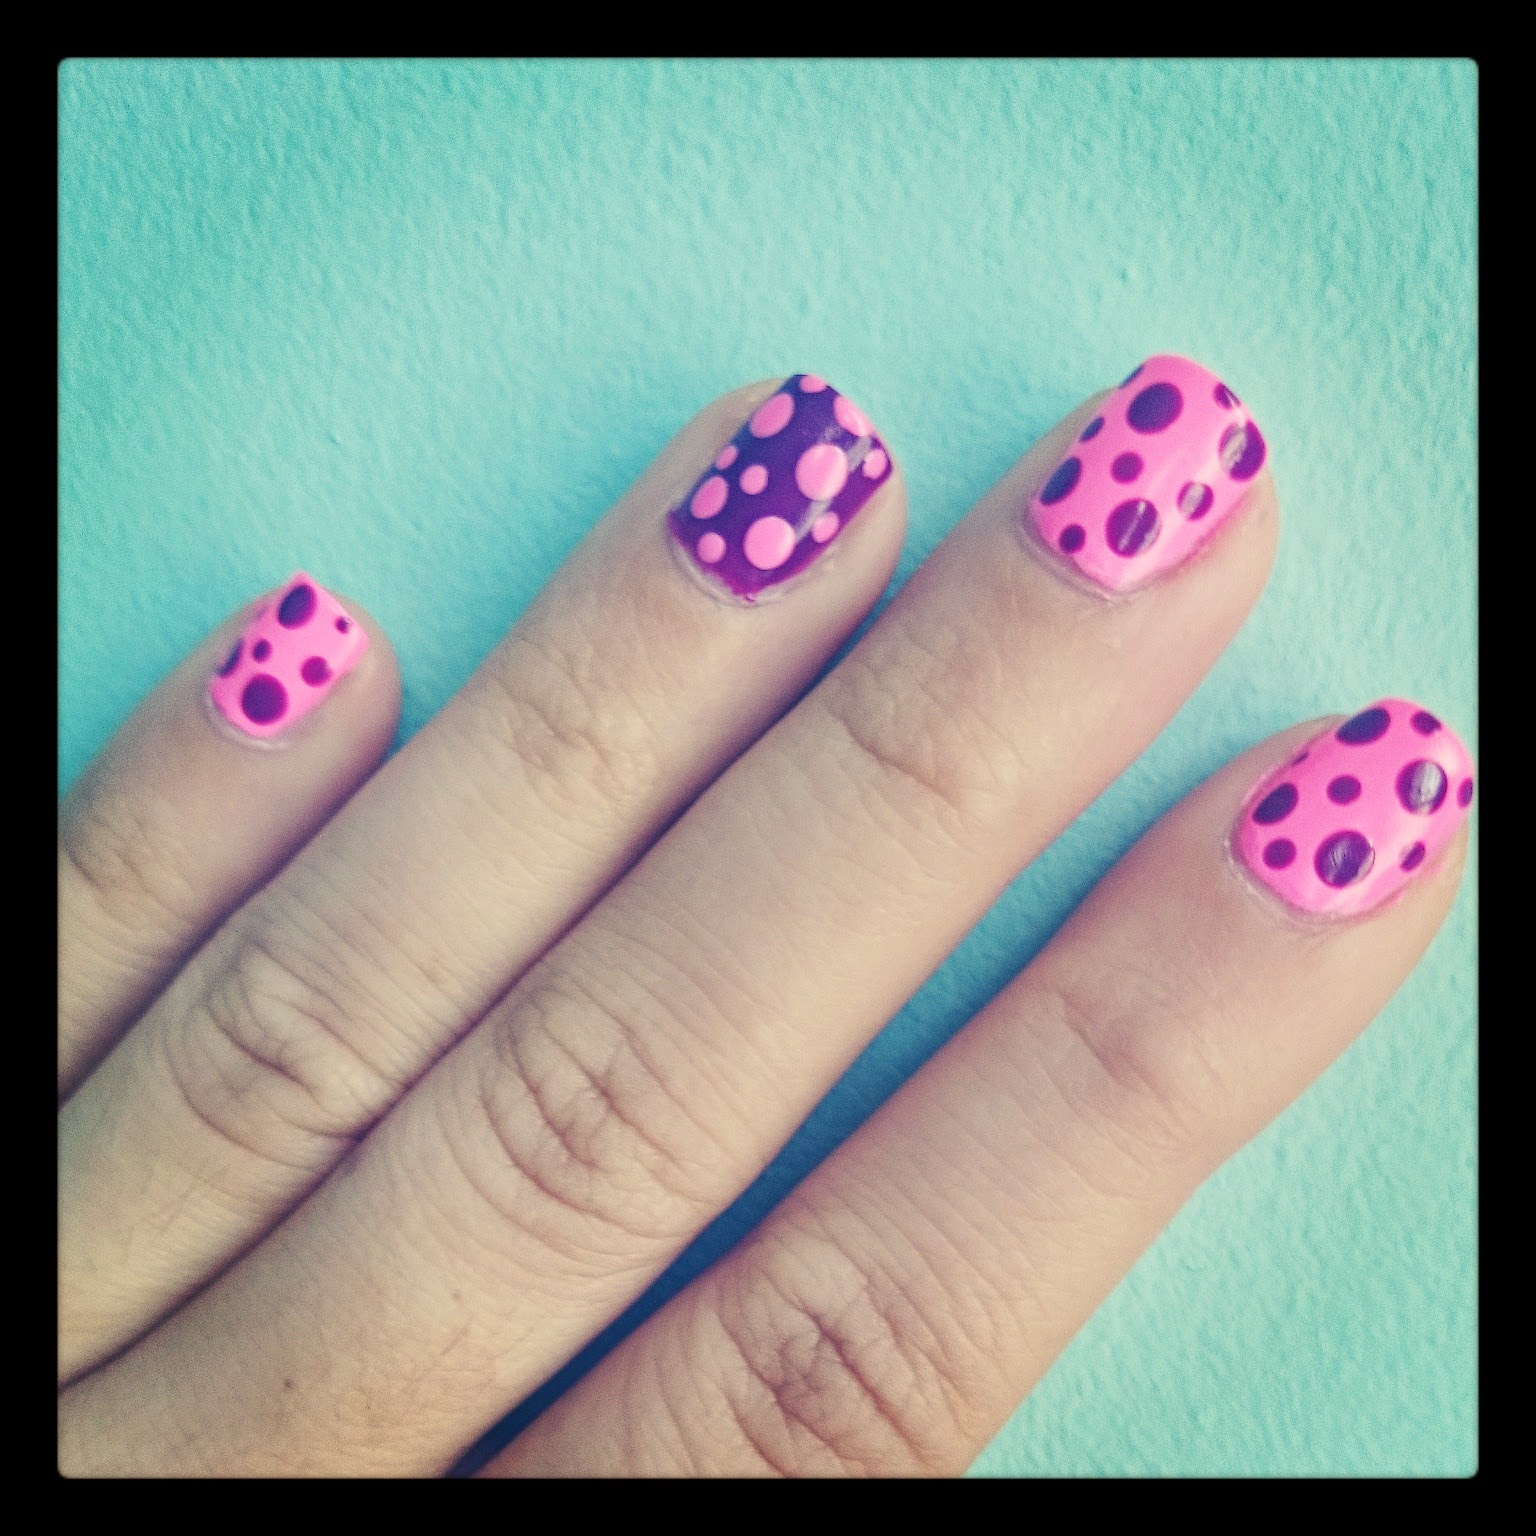 dotticure mani manicure dotting tools nail polish art